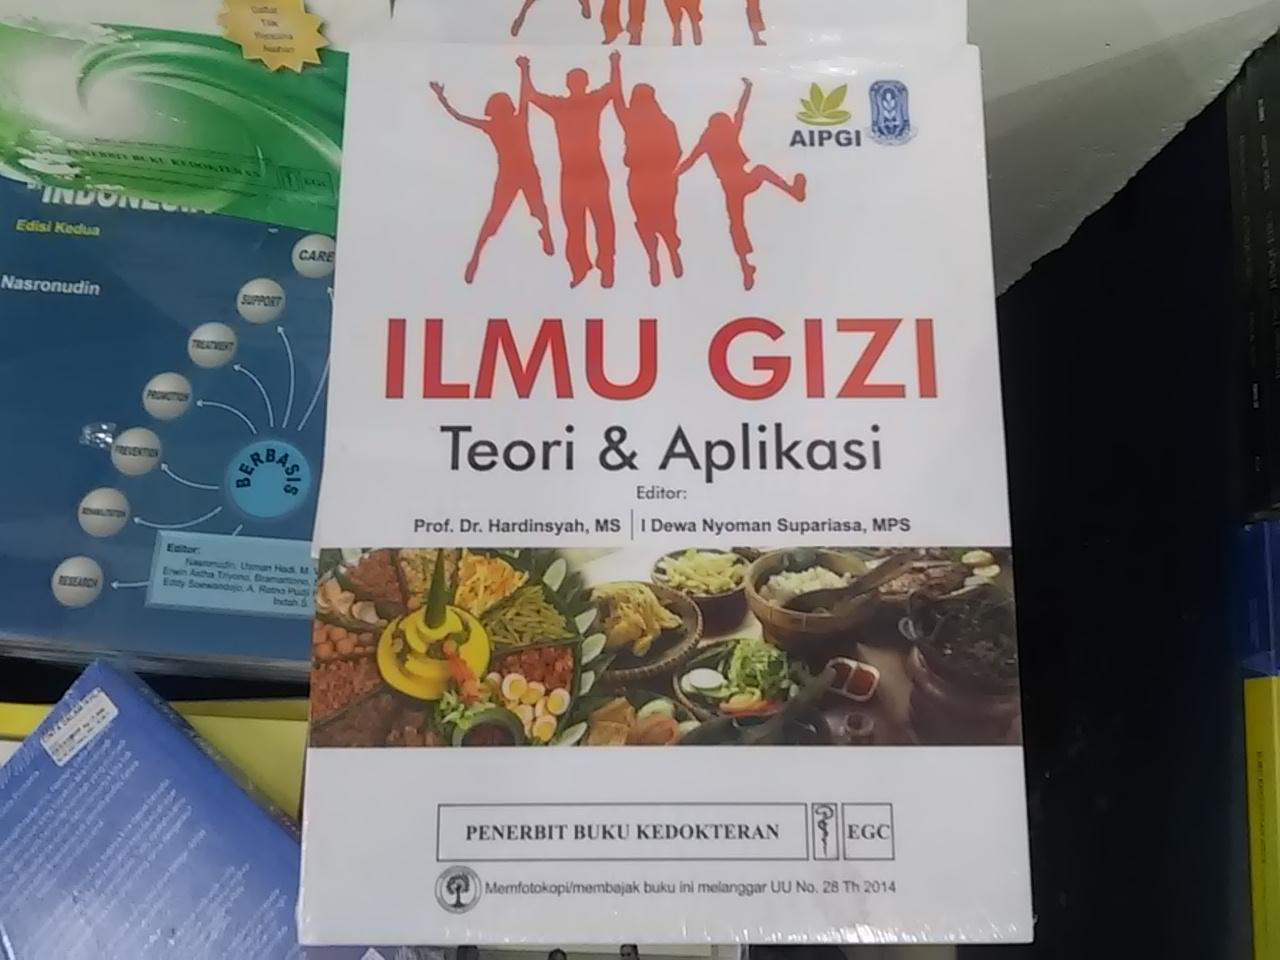 Buku Ilmu Gizi Teori dan Aplikasi - Prof. Dr. Hardiansyah, MS, dkk.